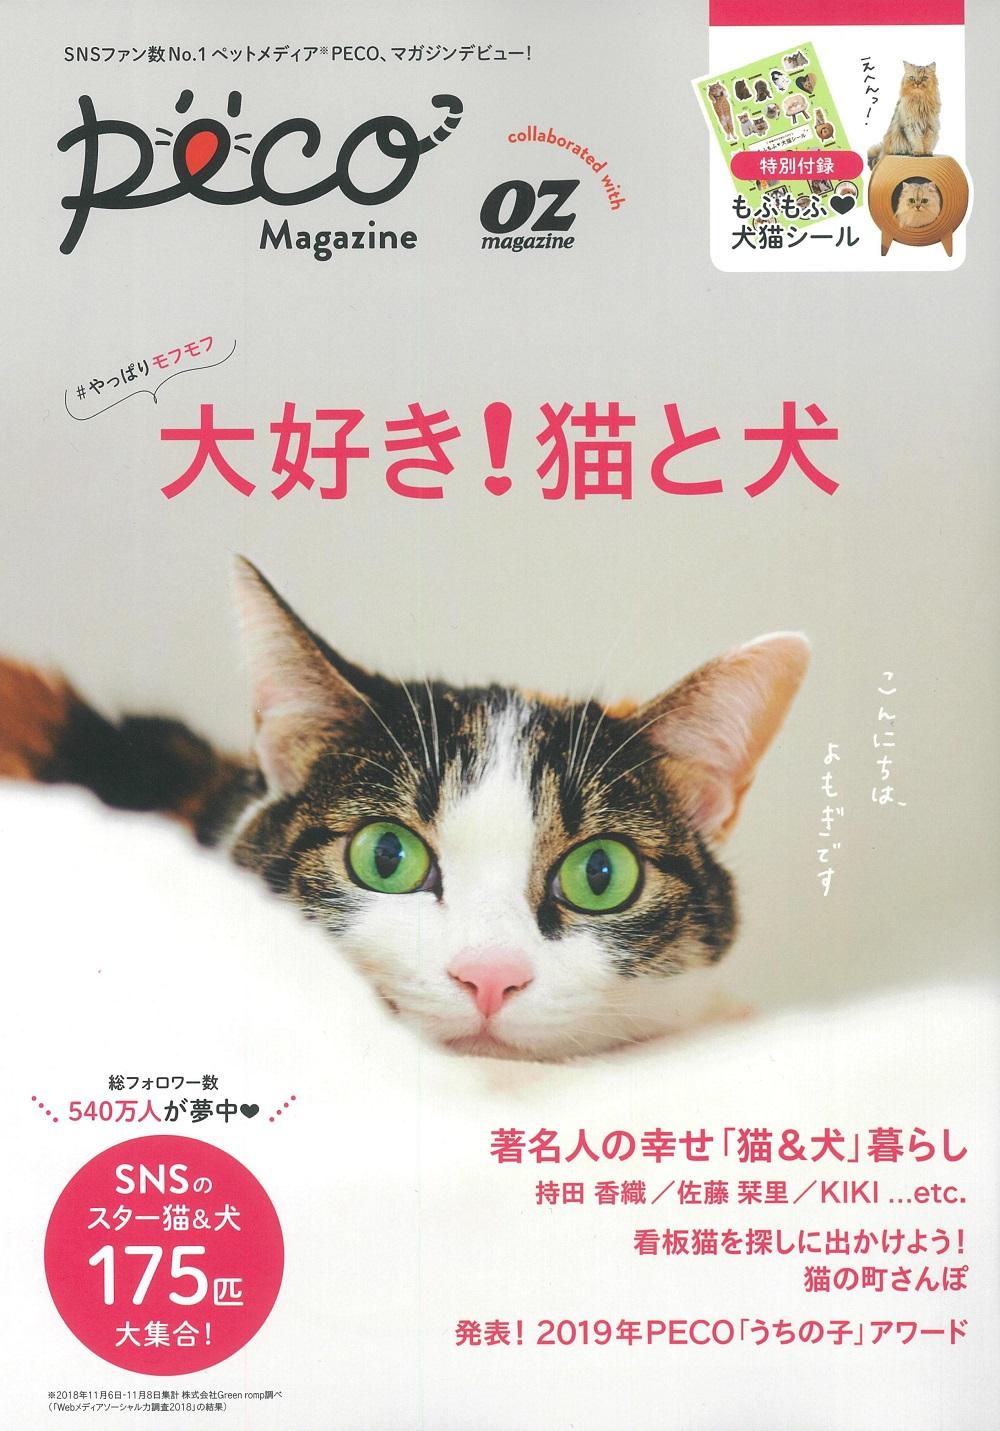 20190328_ZOマガジンxPECO MOOK_COVER.jpg